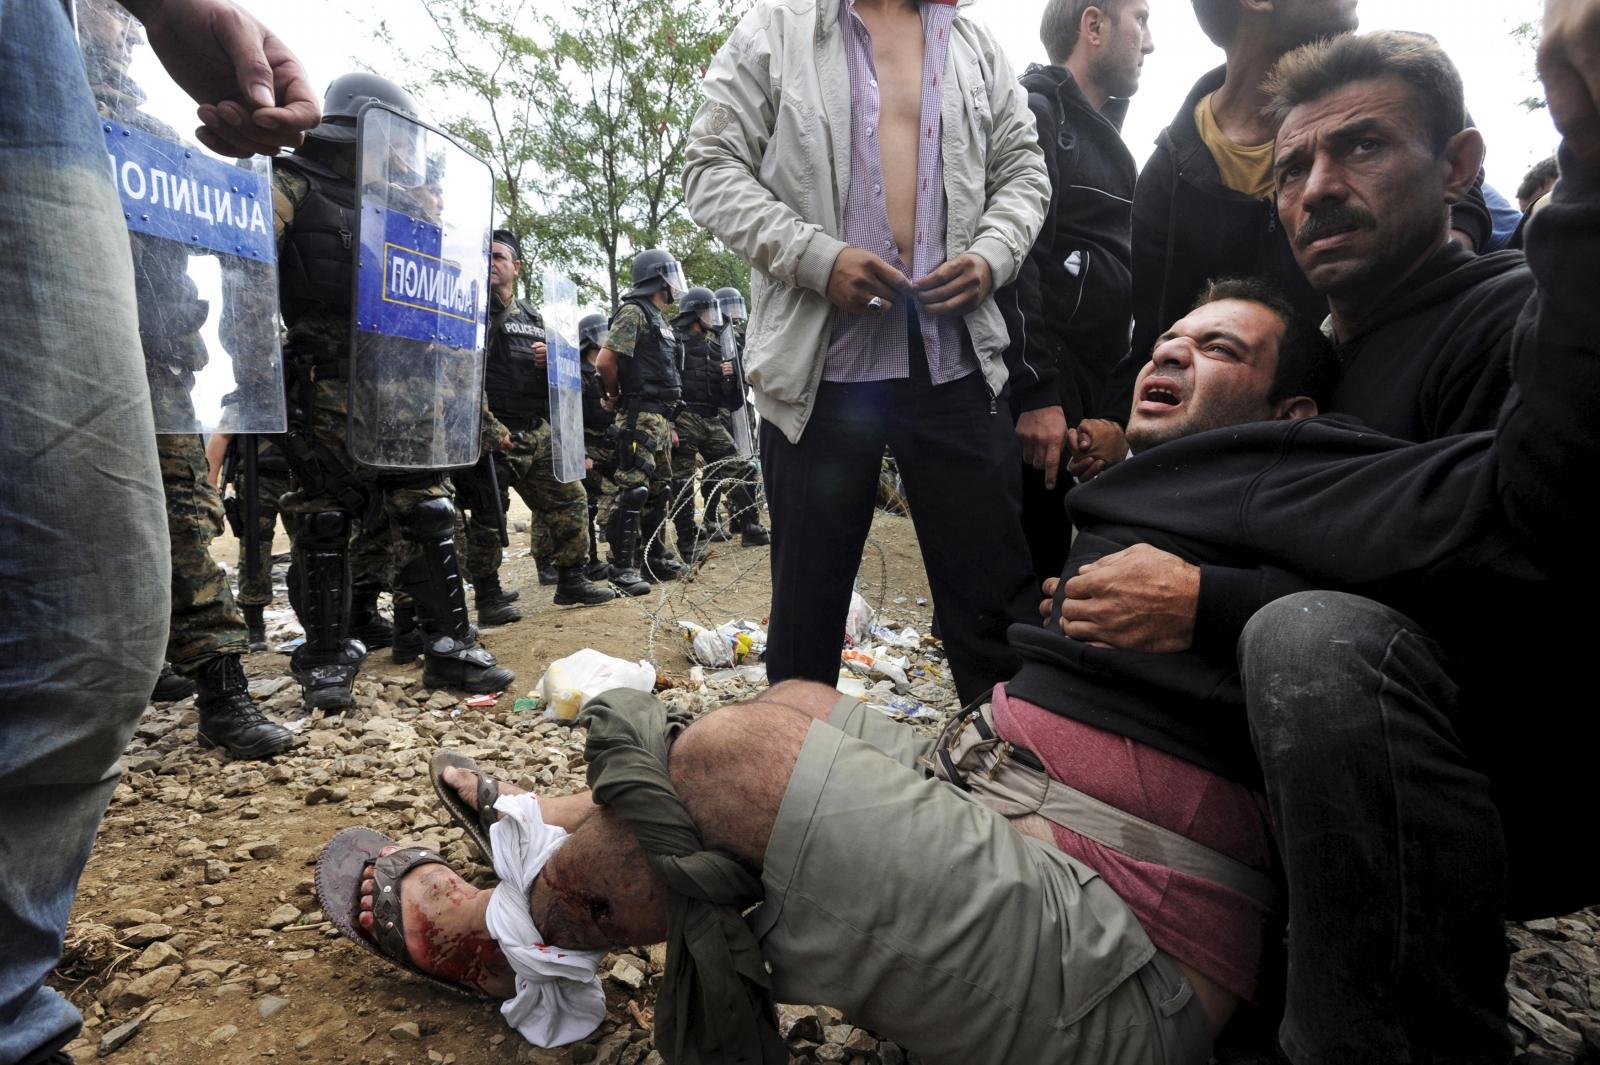 Macedonia tear gas migrants Greece